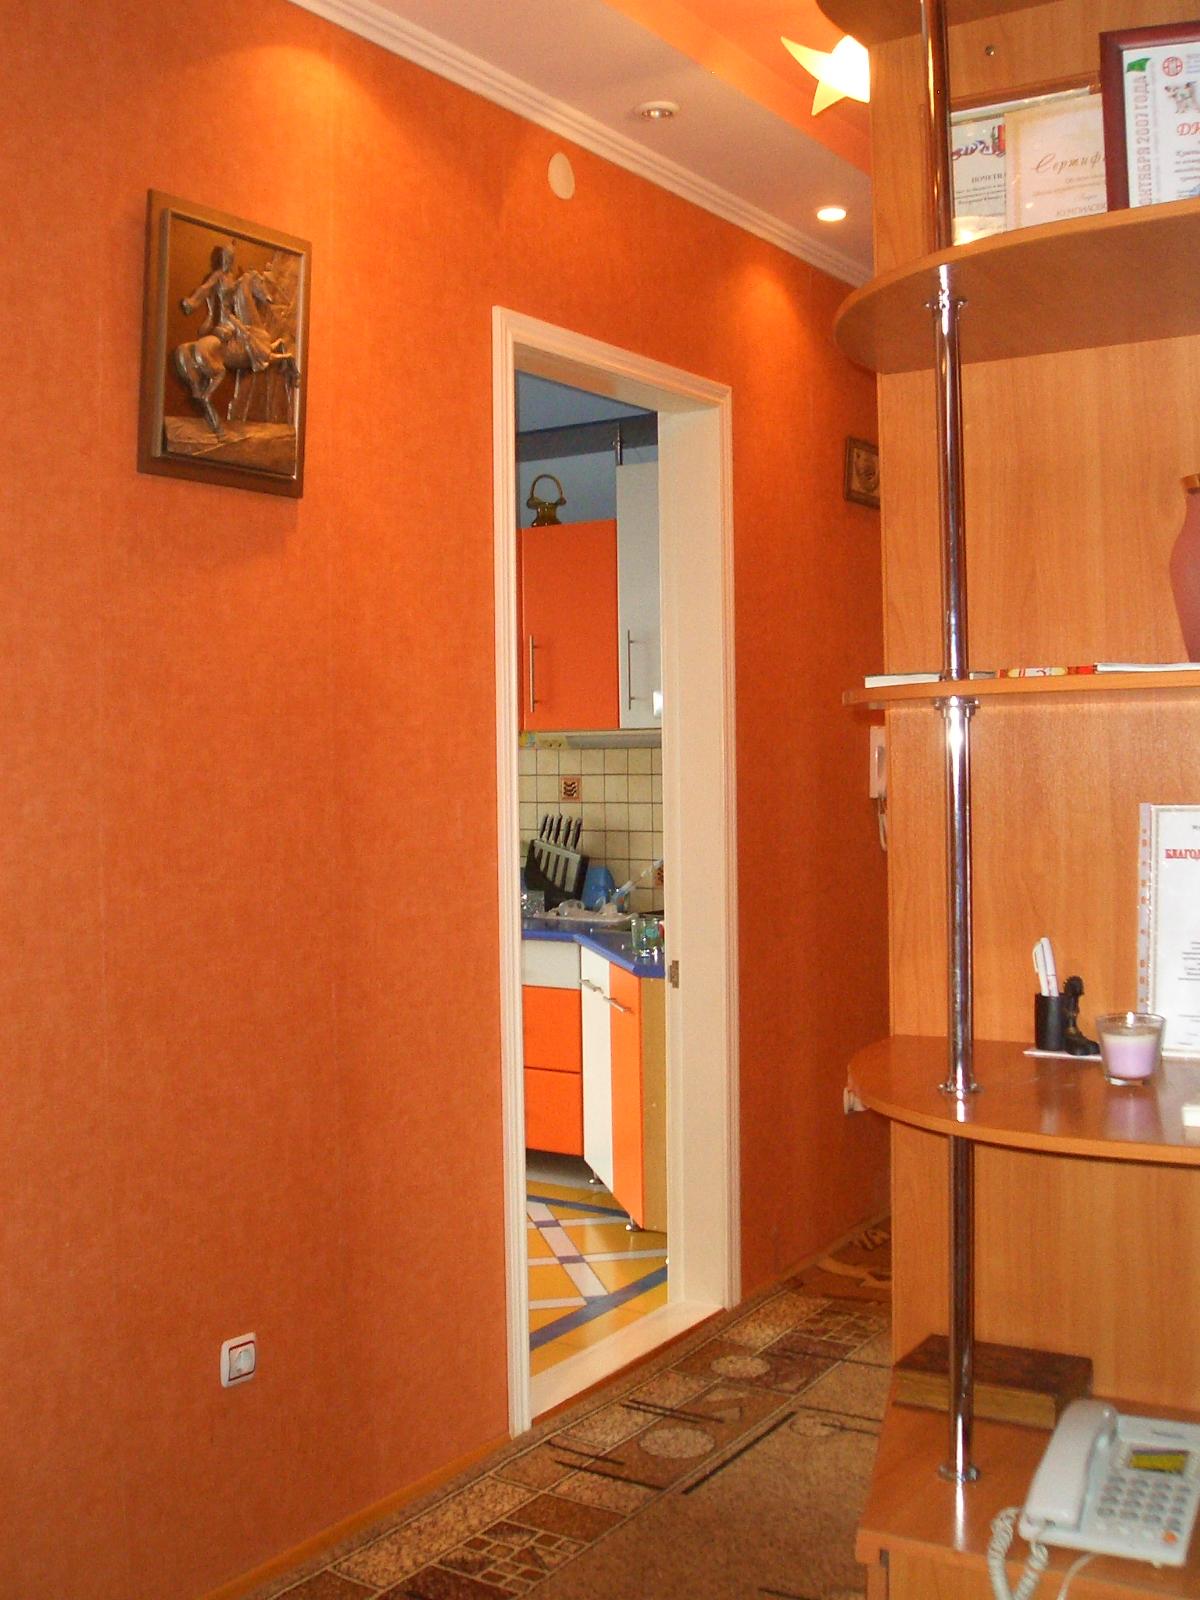 Квартира 4 комнатная в Майкоп район Нефтеразведка